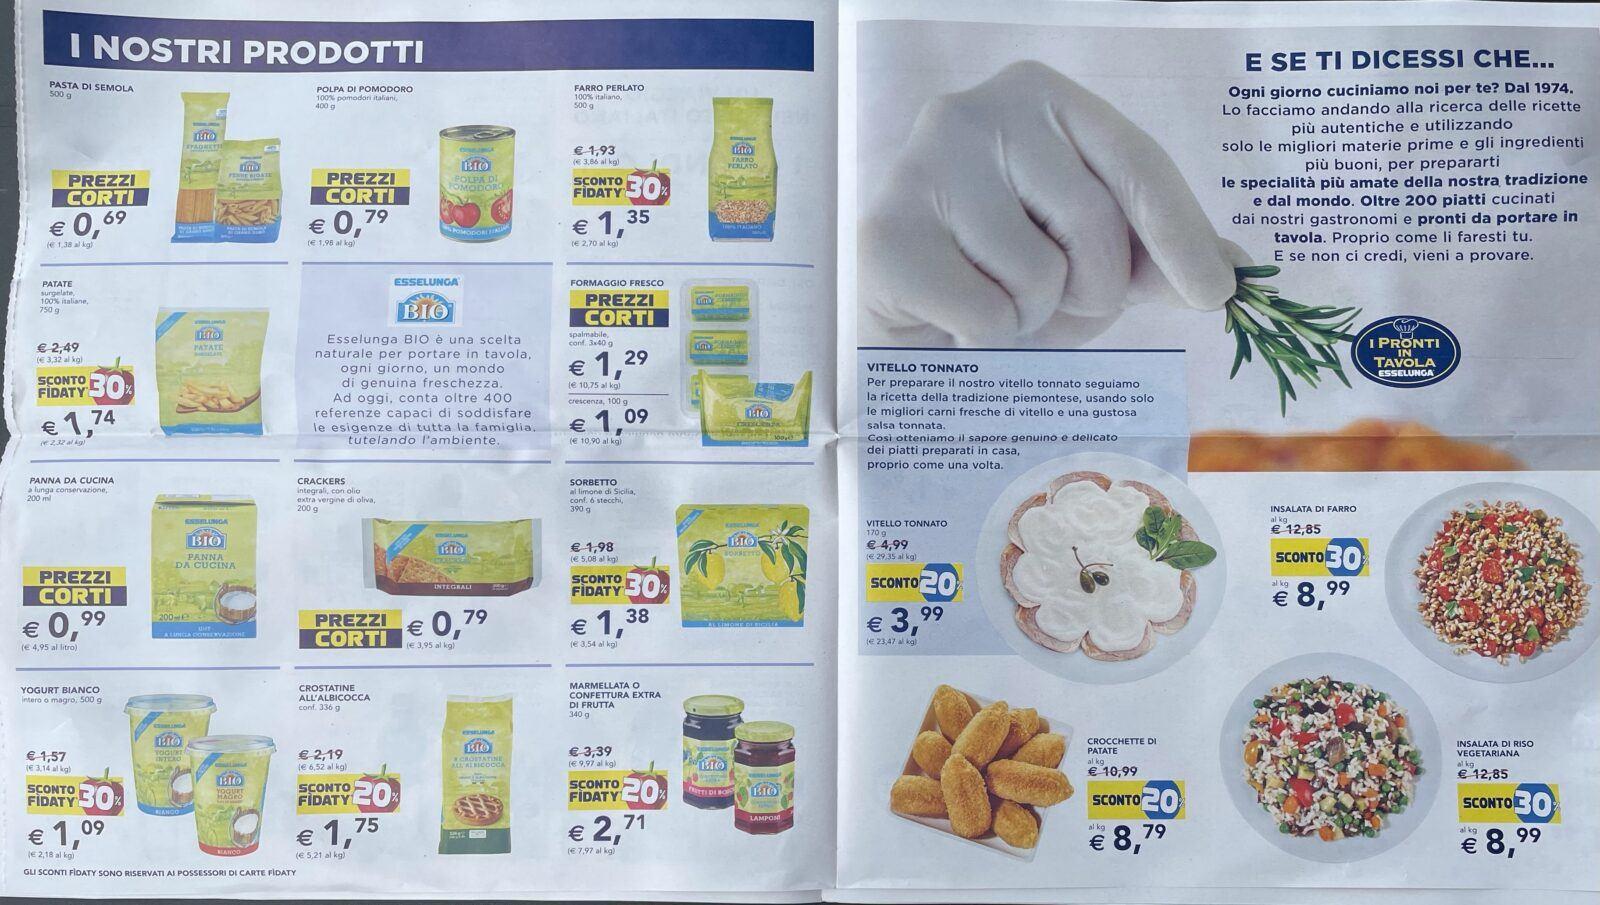 www.scontrinofelice.it img 7133 1 1600x905 Anteprima volantino Esselunga valido dal 10/06 al 19/06 2021